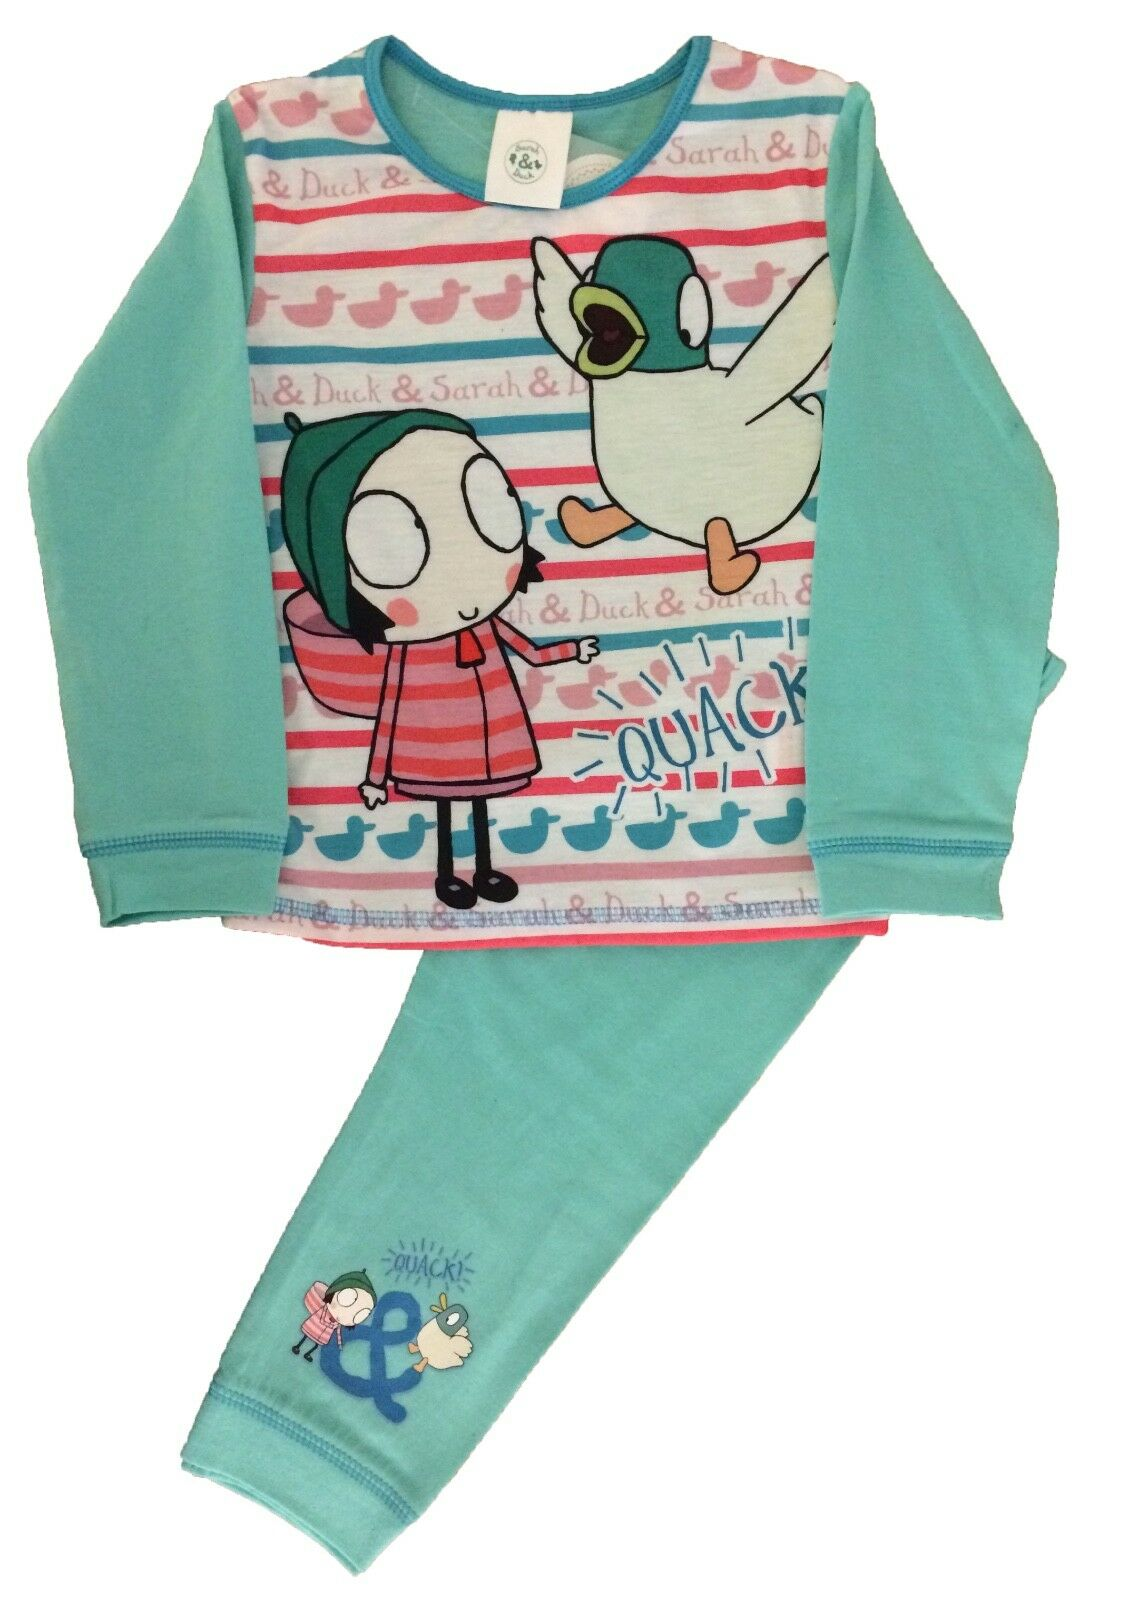 Girls Sarah and Duck Pyjamas Cbeebies Aqua 18-24 months to 4-5 years New